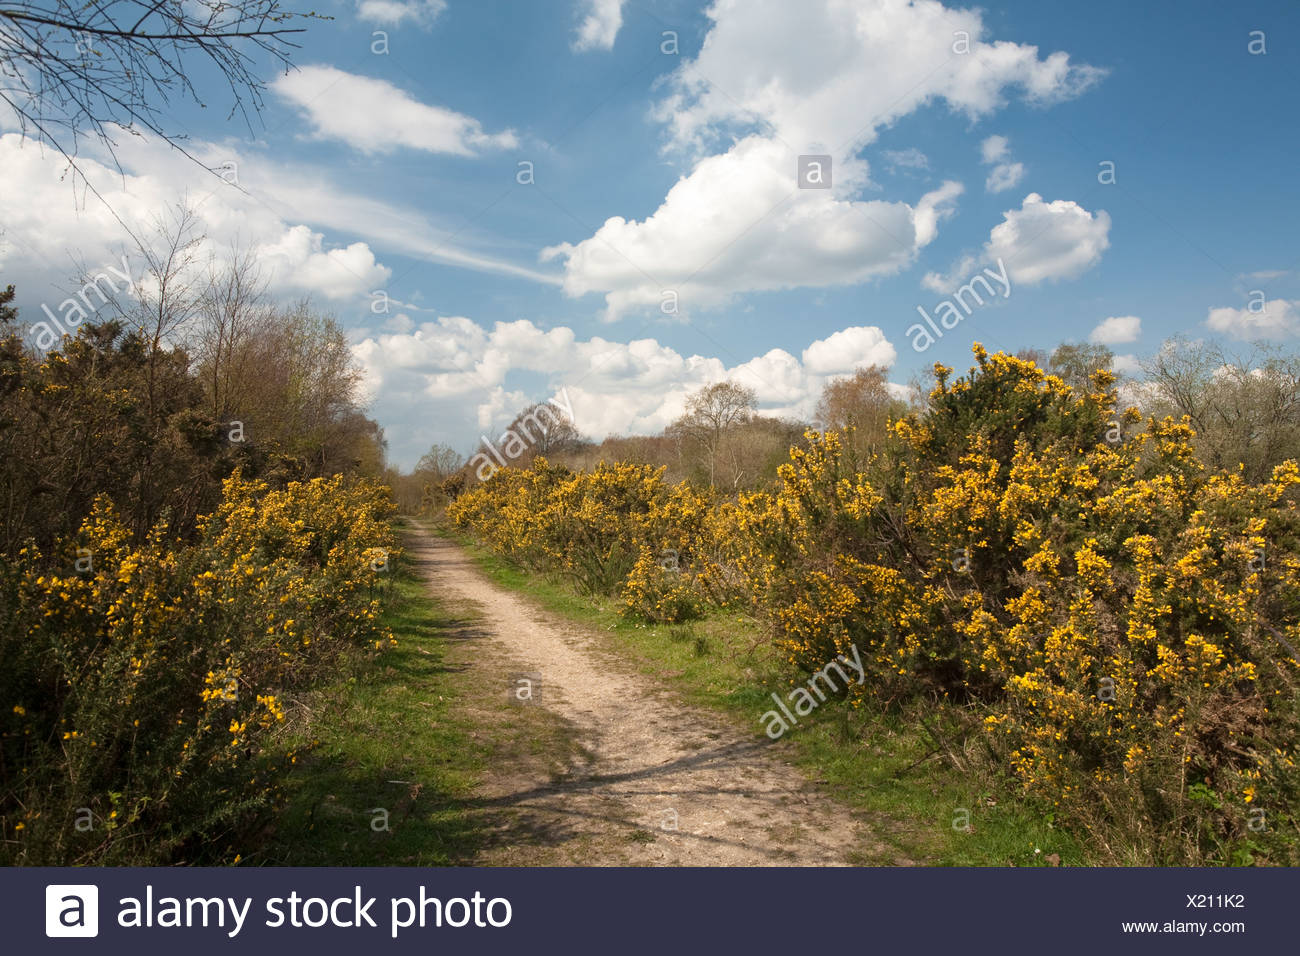 Le ressort de Greenham Common, près de Newbury, Berkshire, Royaume-Uni Photo Stock